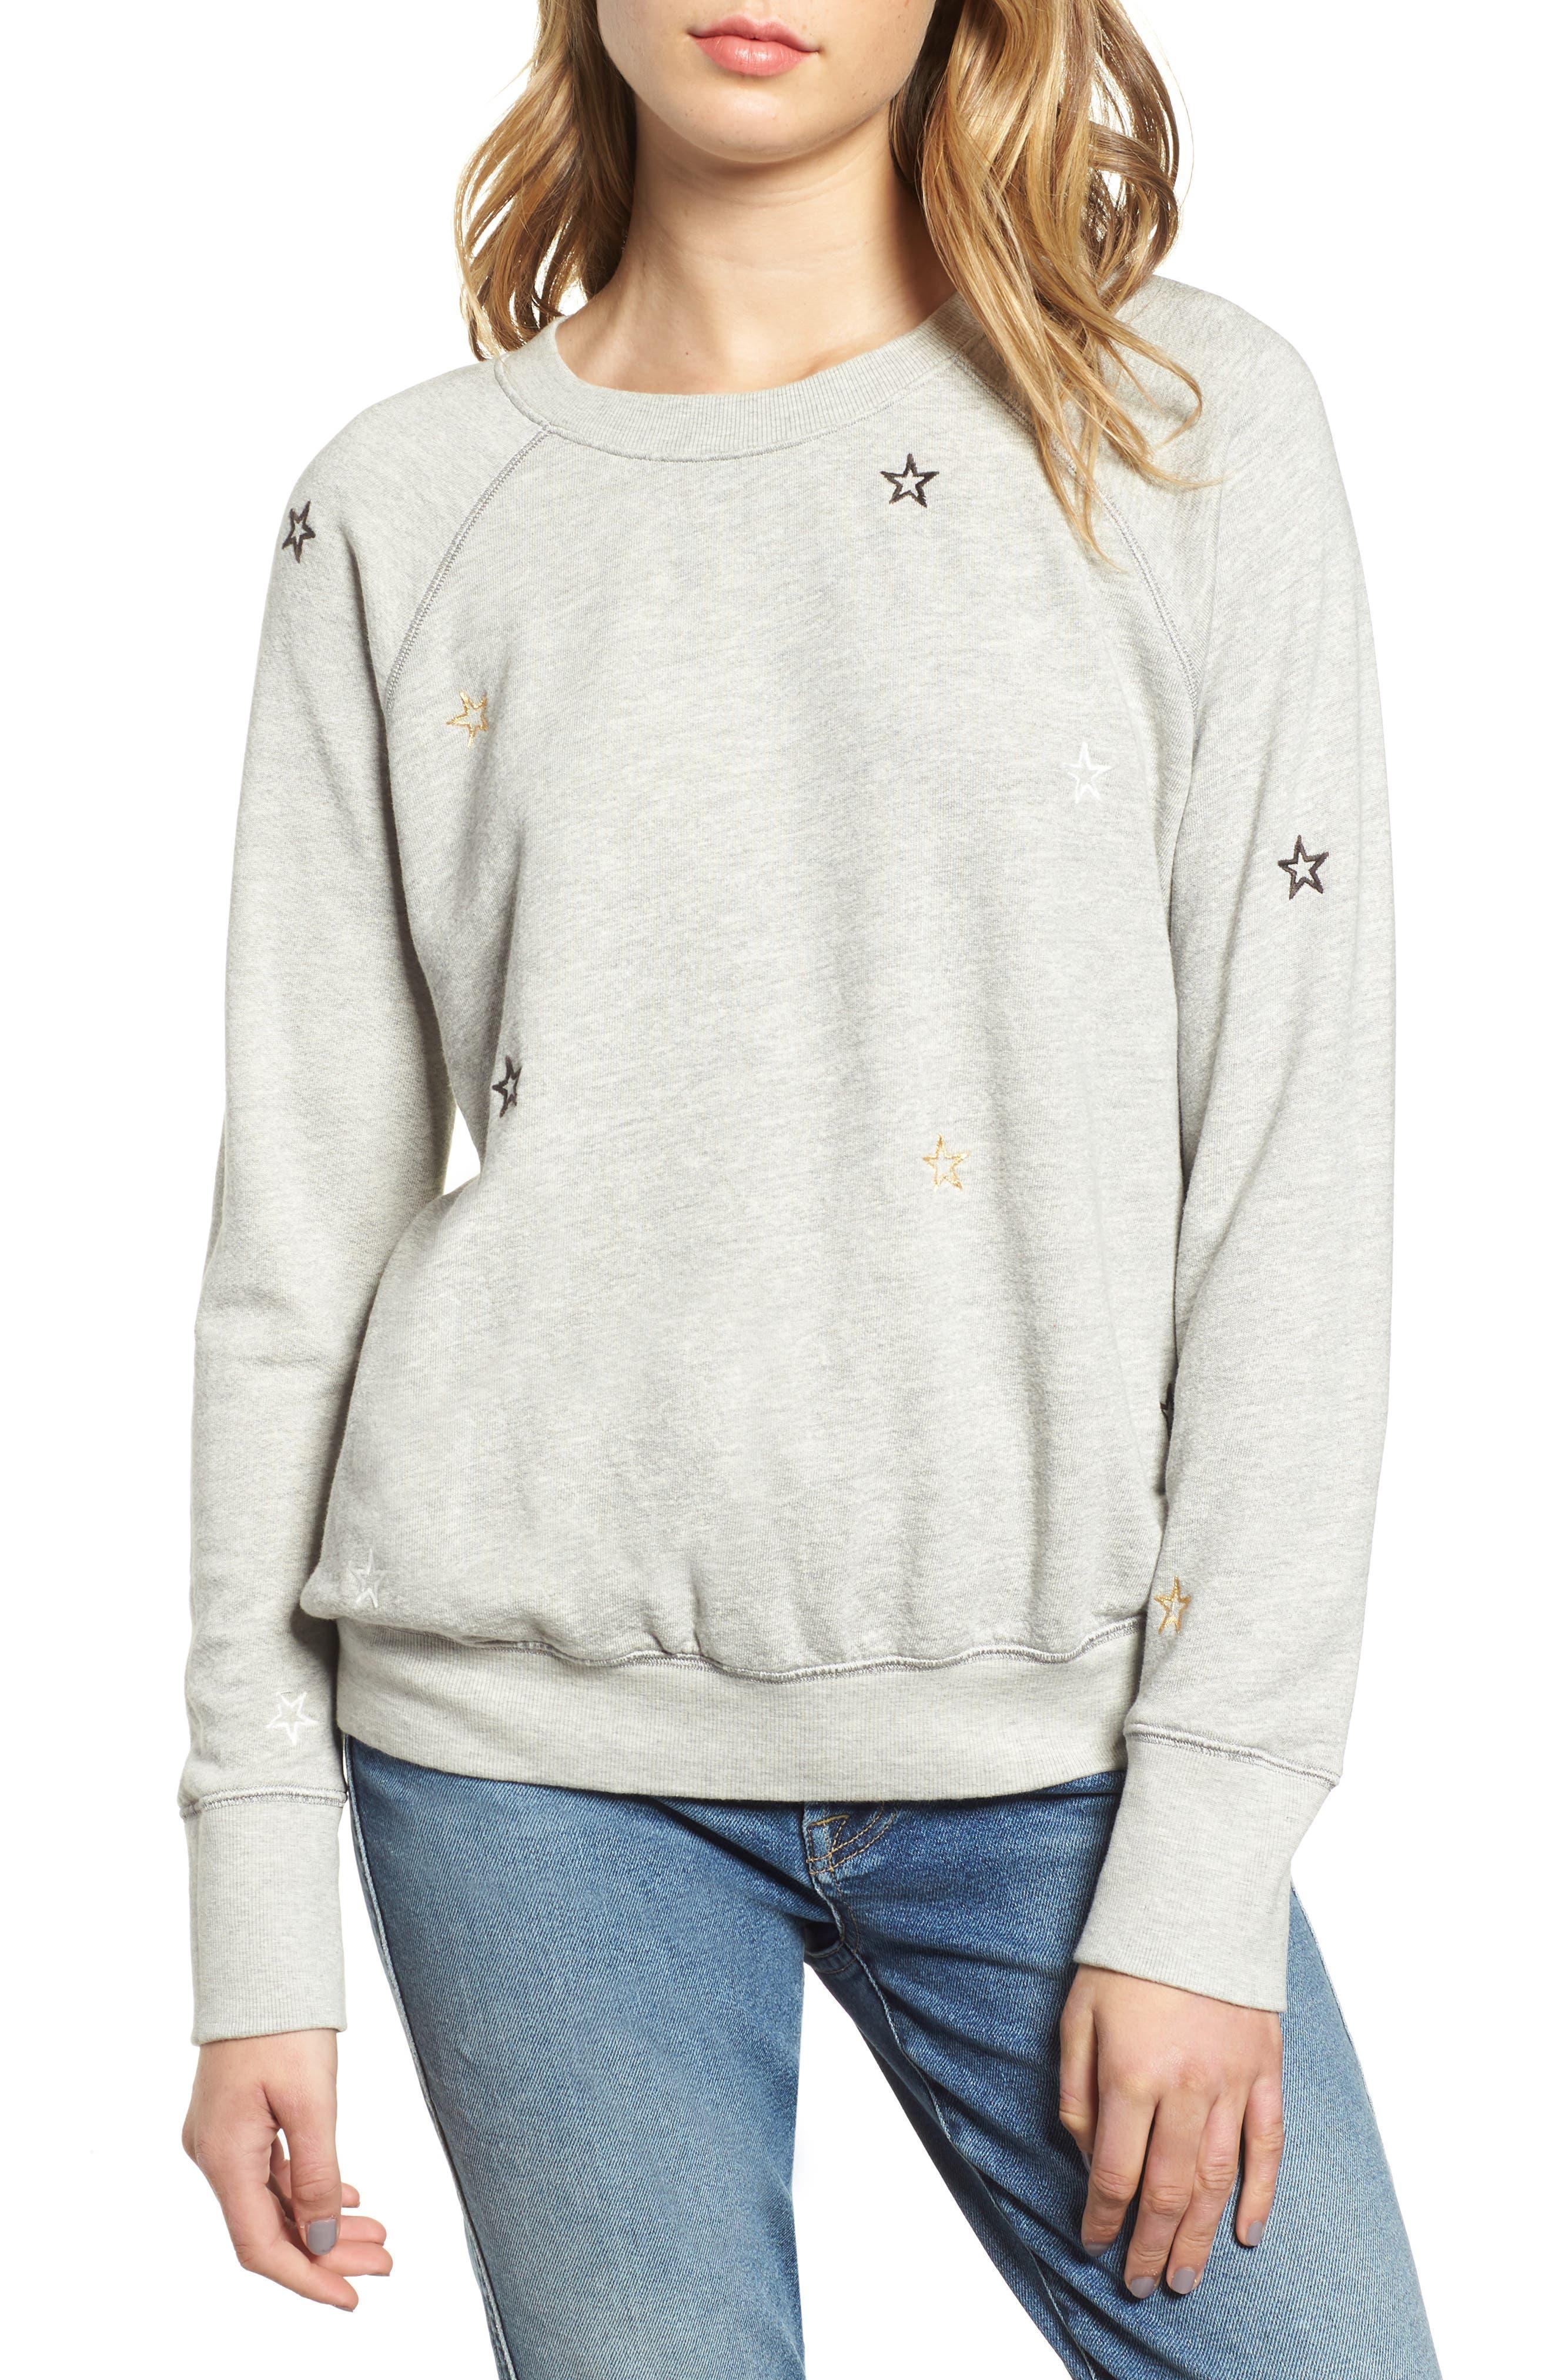 Star Embroidered Sweatshirt,                         Main,                         color, HEATHER GREY